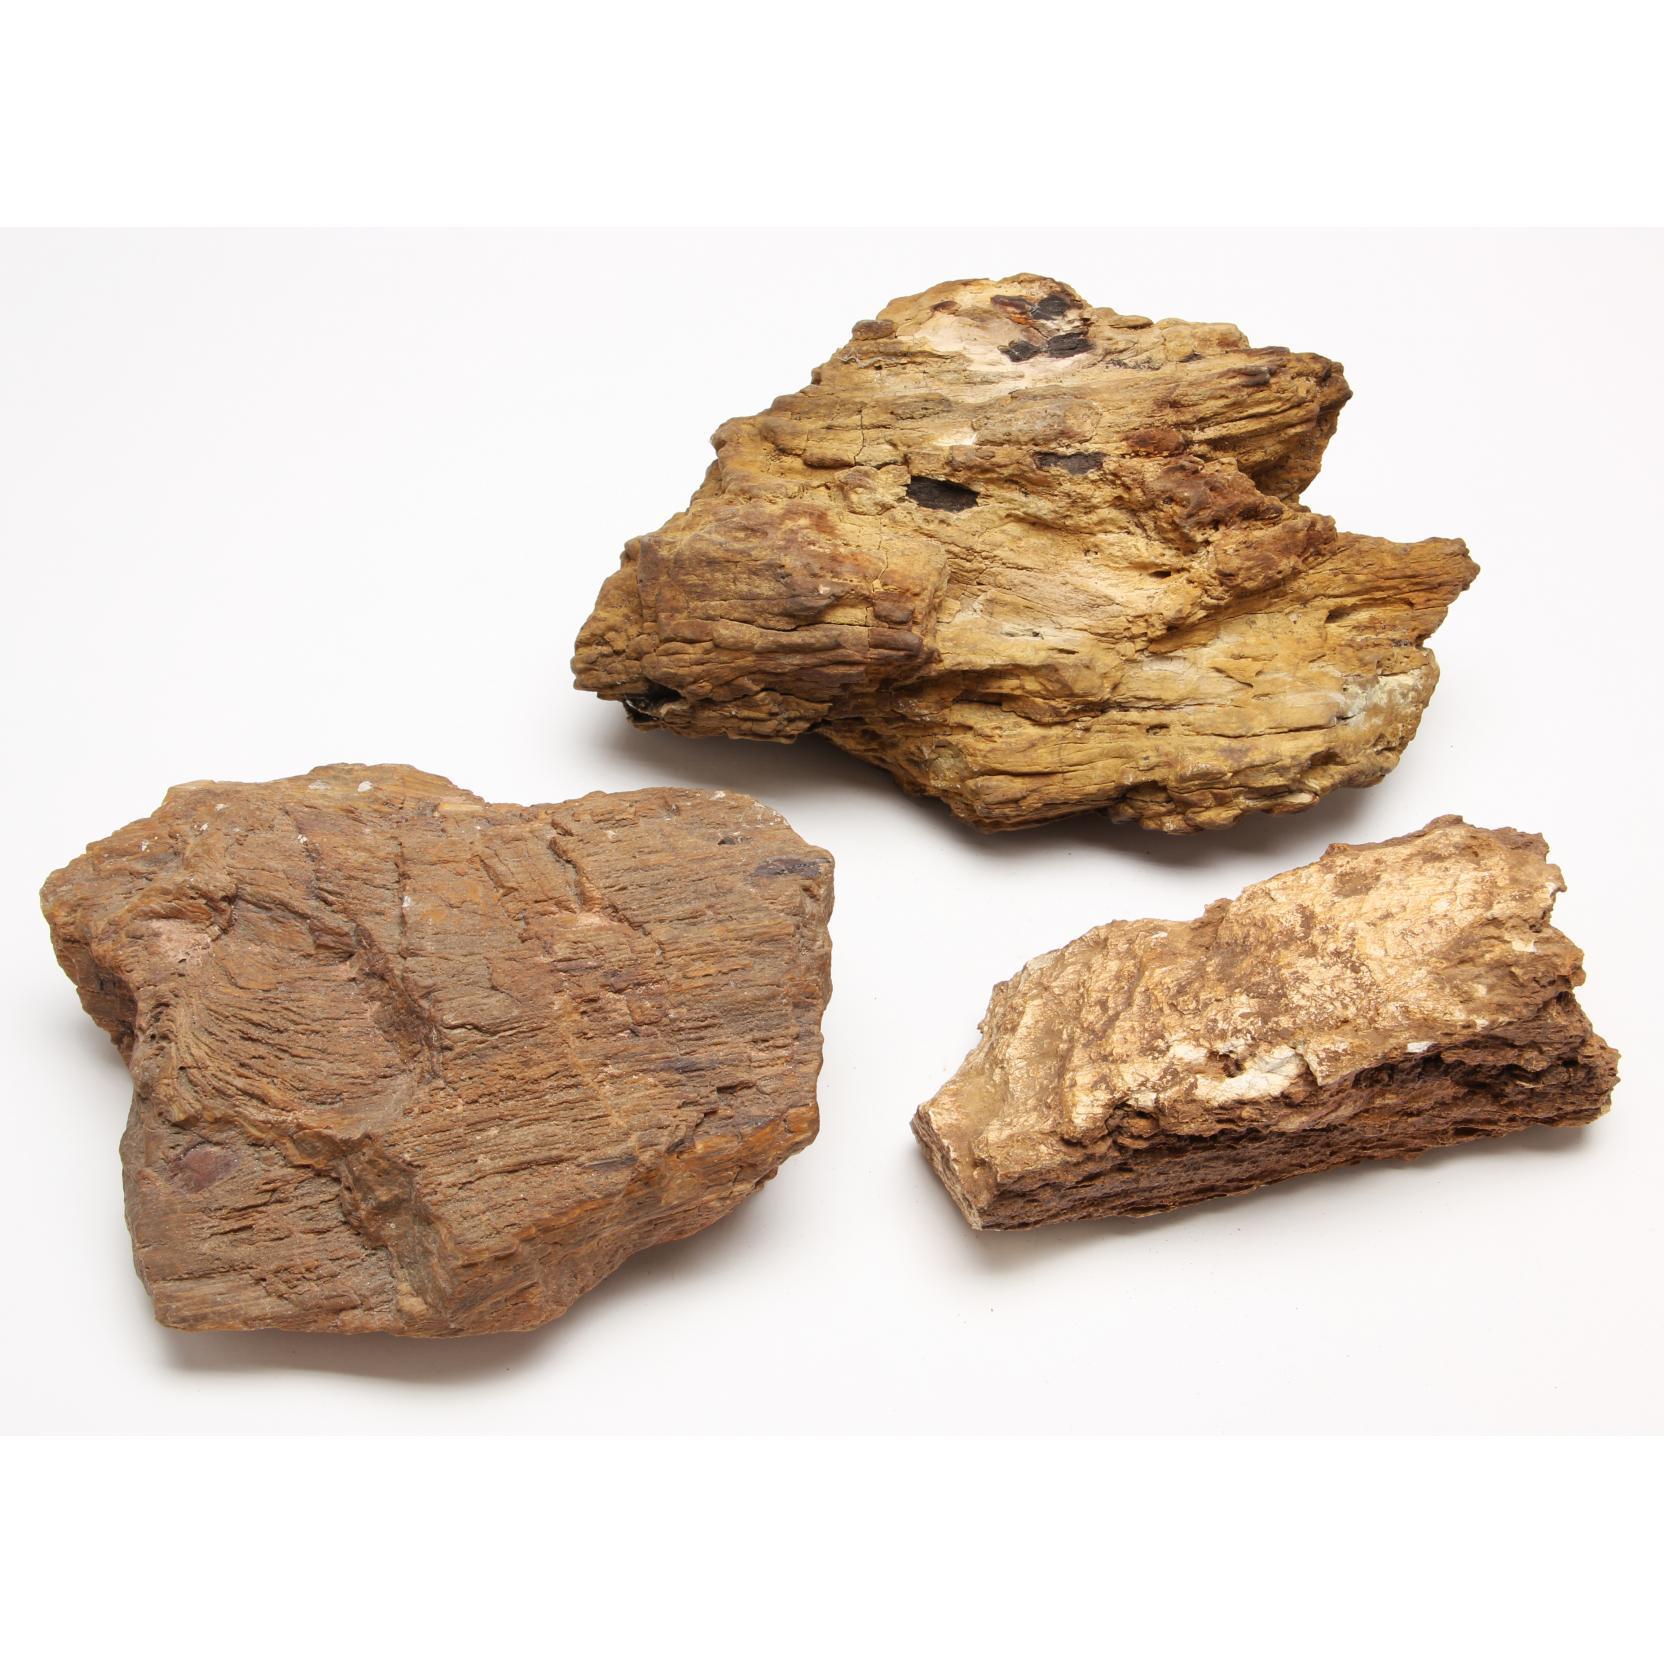 three-pieces-of-petrified-wood